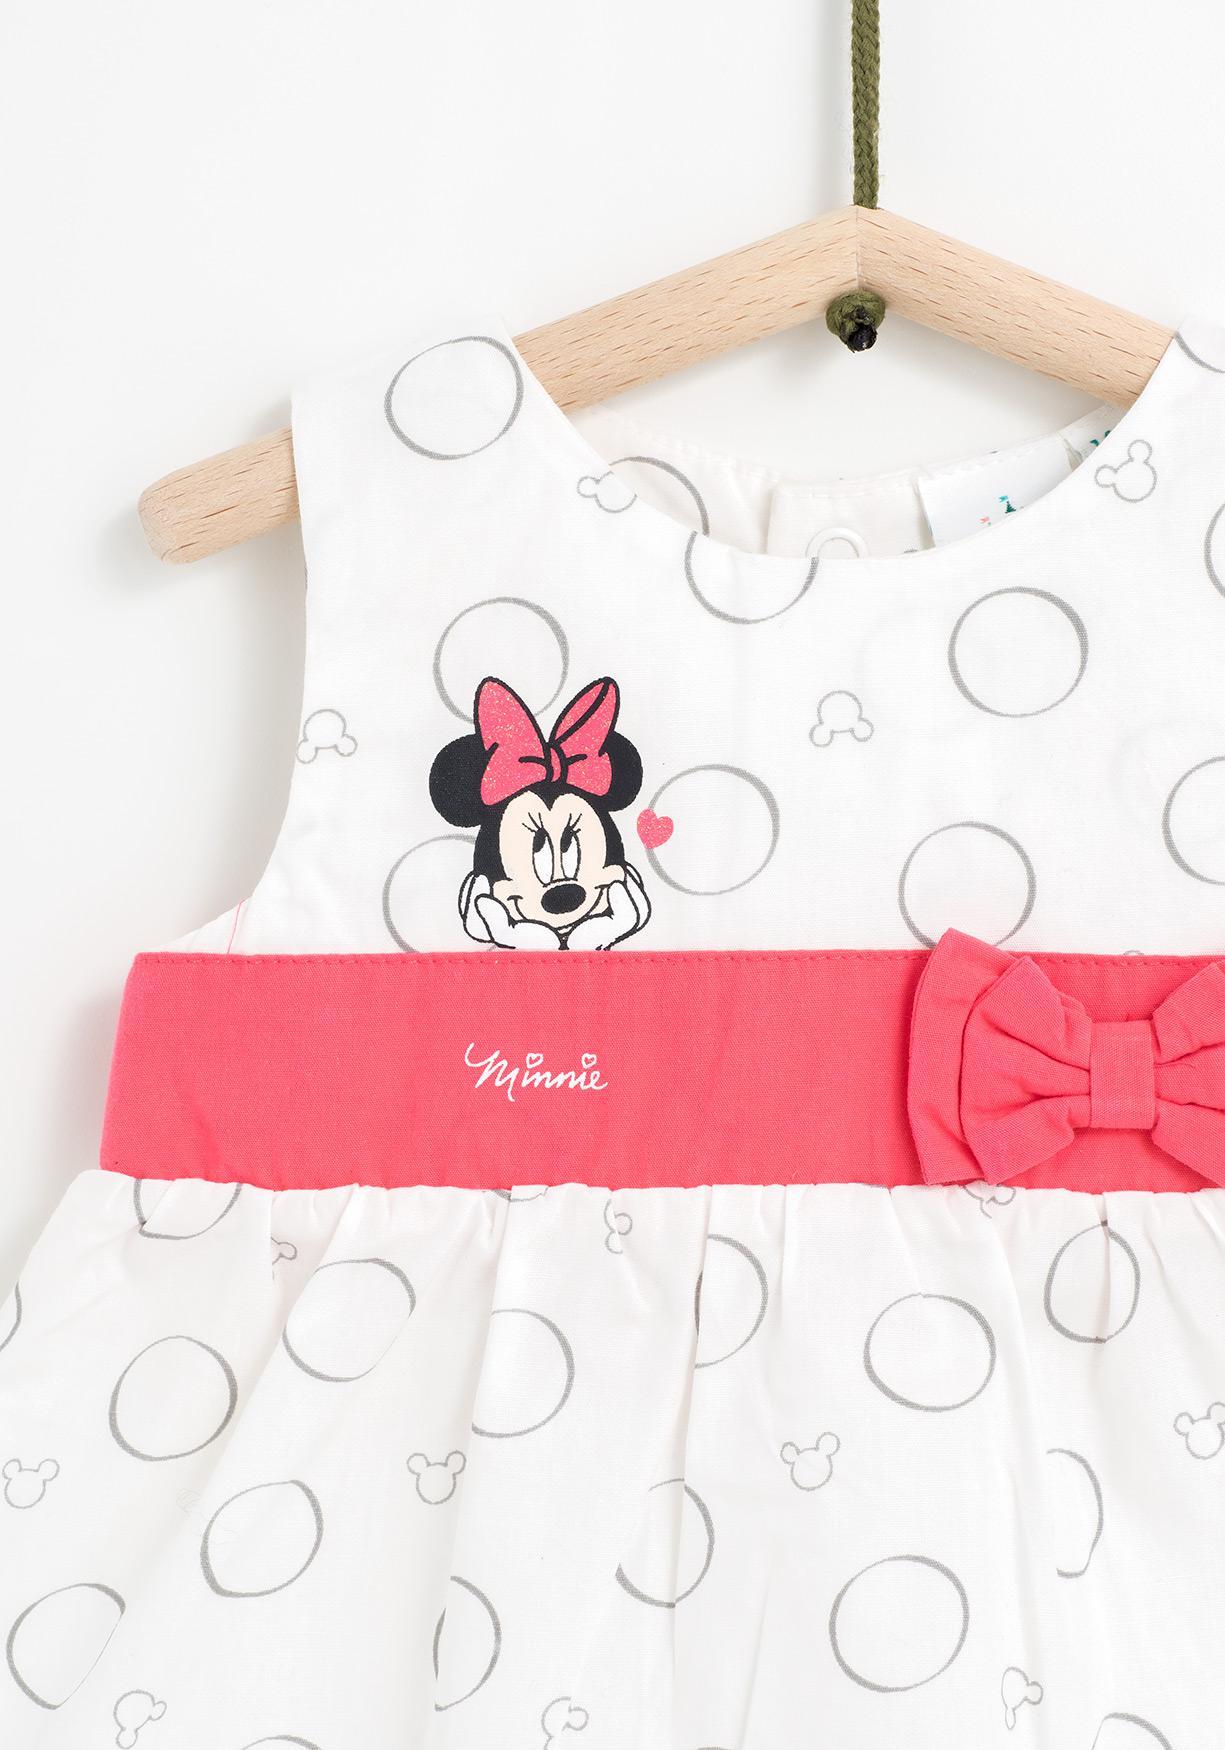 Comprar Vestido para recién nacido Minnie de DISNEY. ¡Aprovéchate de ... 80f5cfc707b